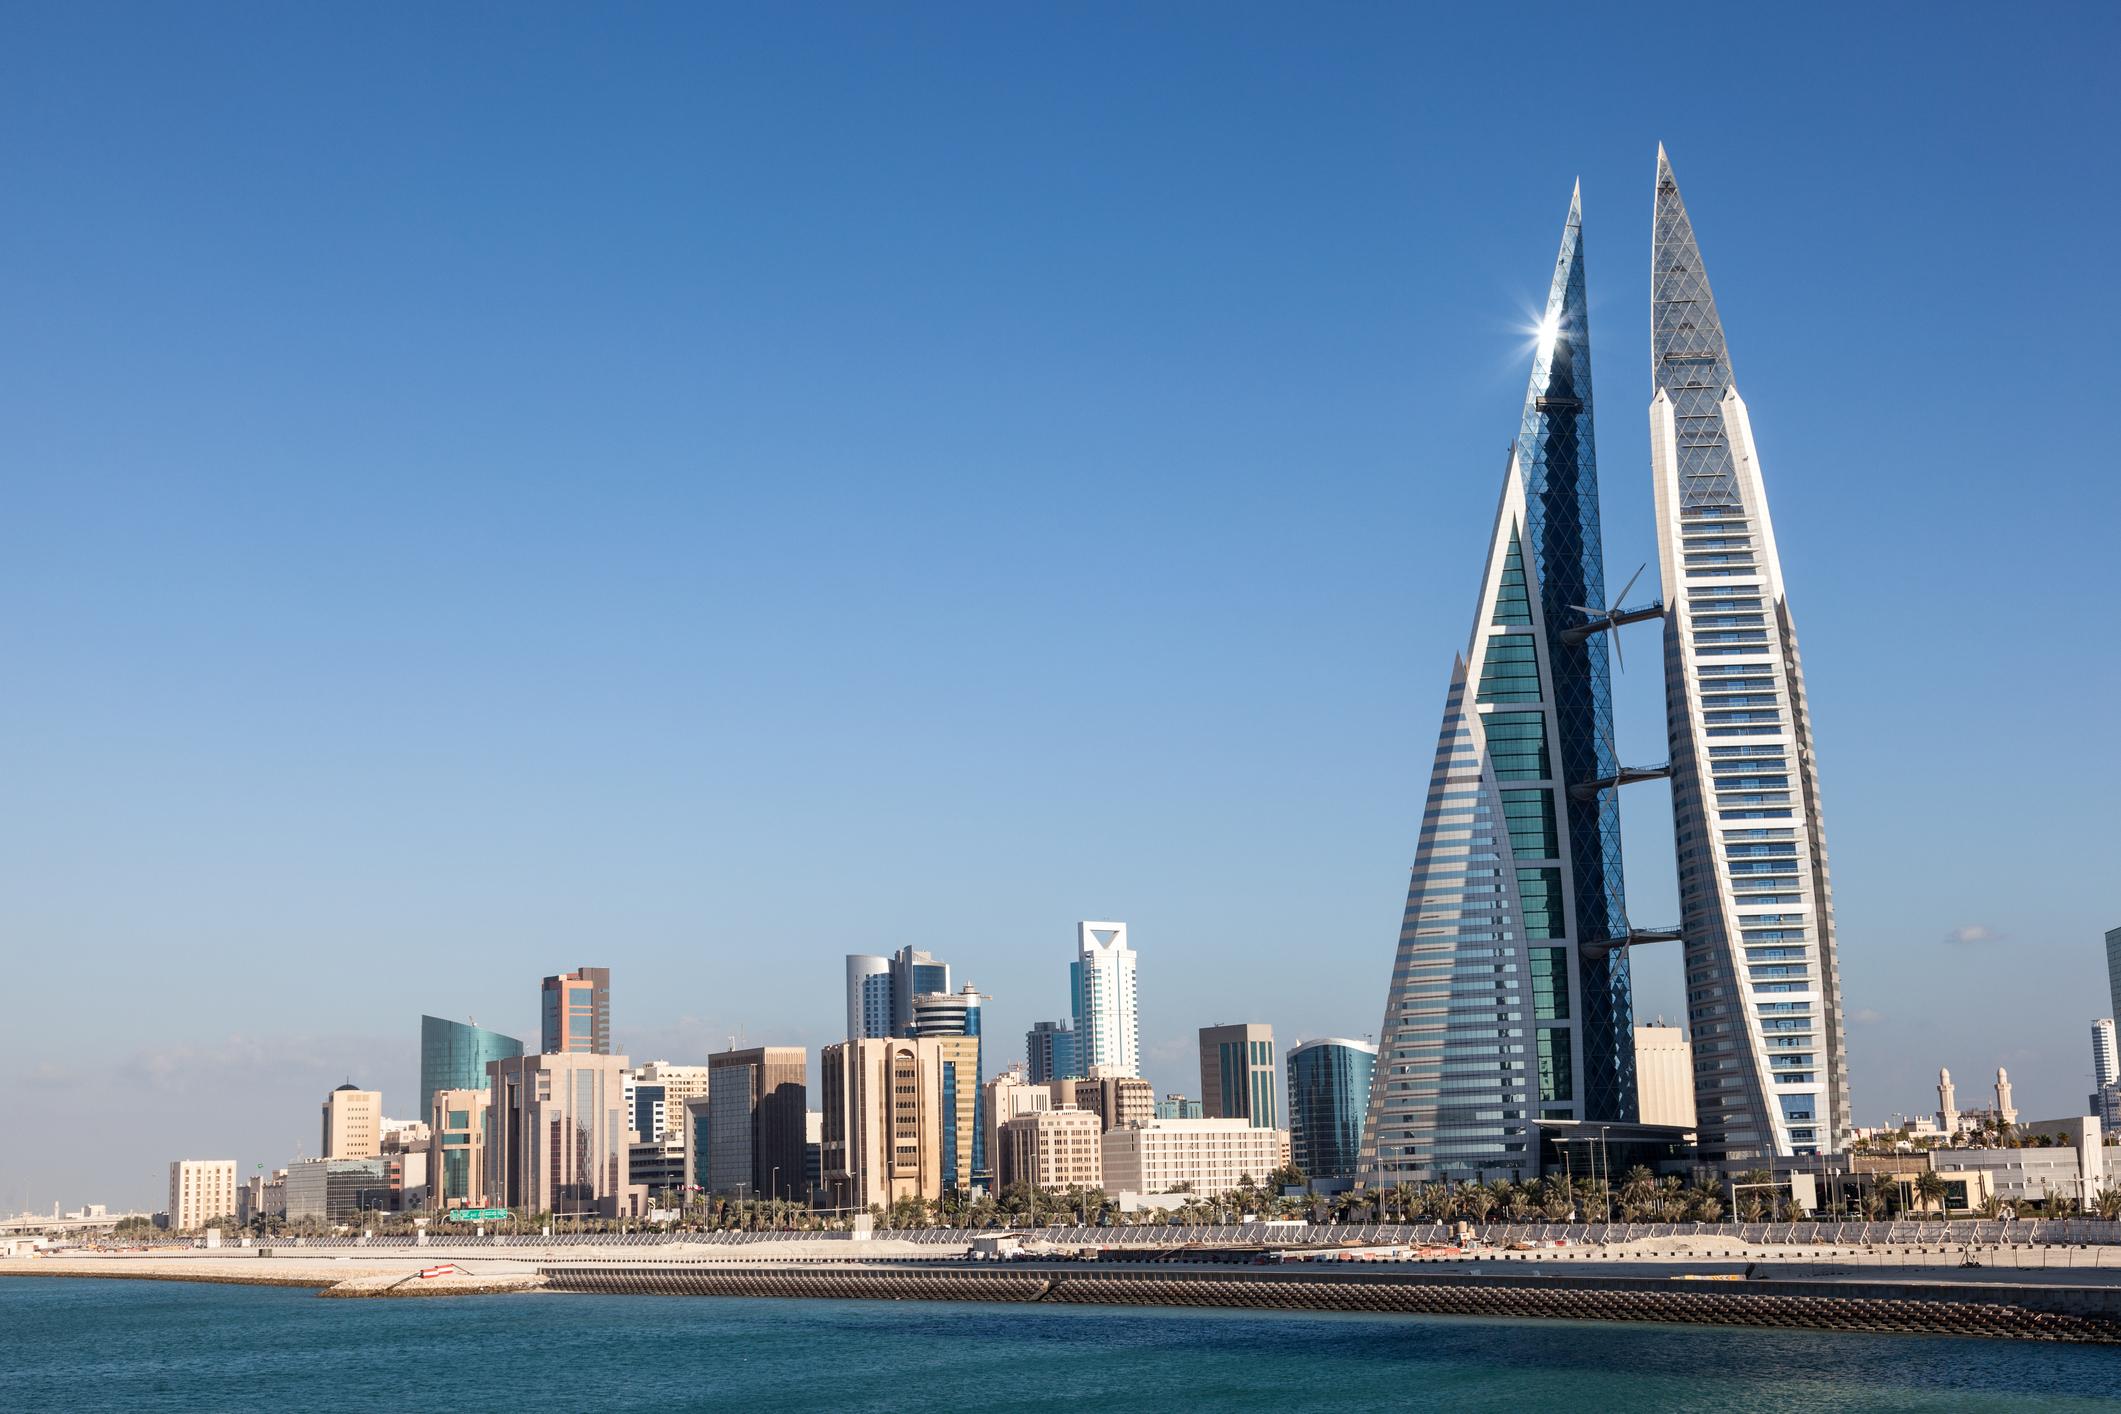 Hardware & IoT Accelerator - Manama, Bahrain